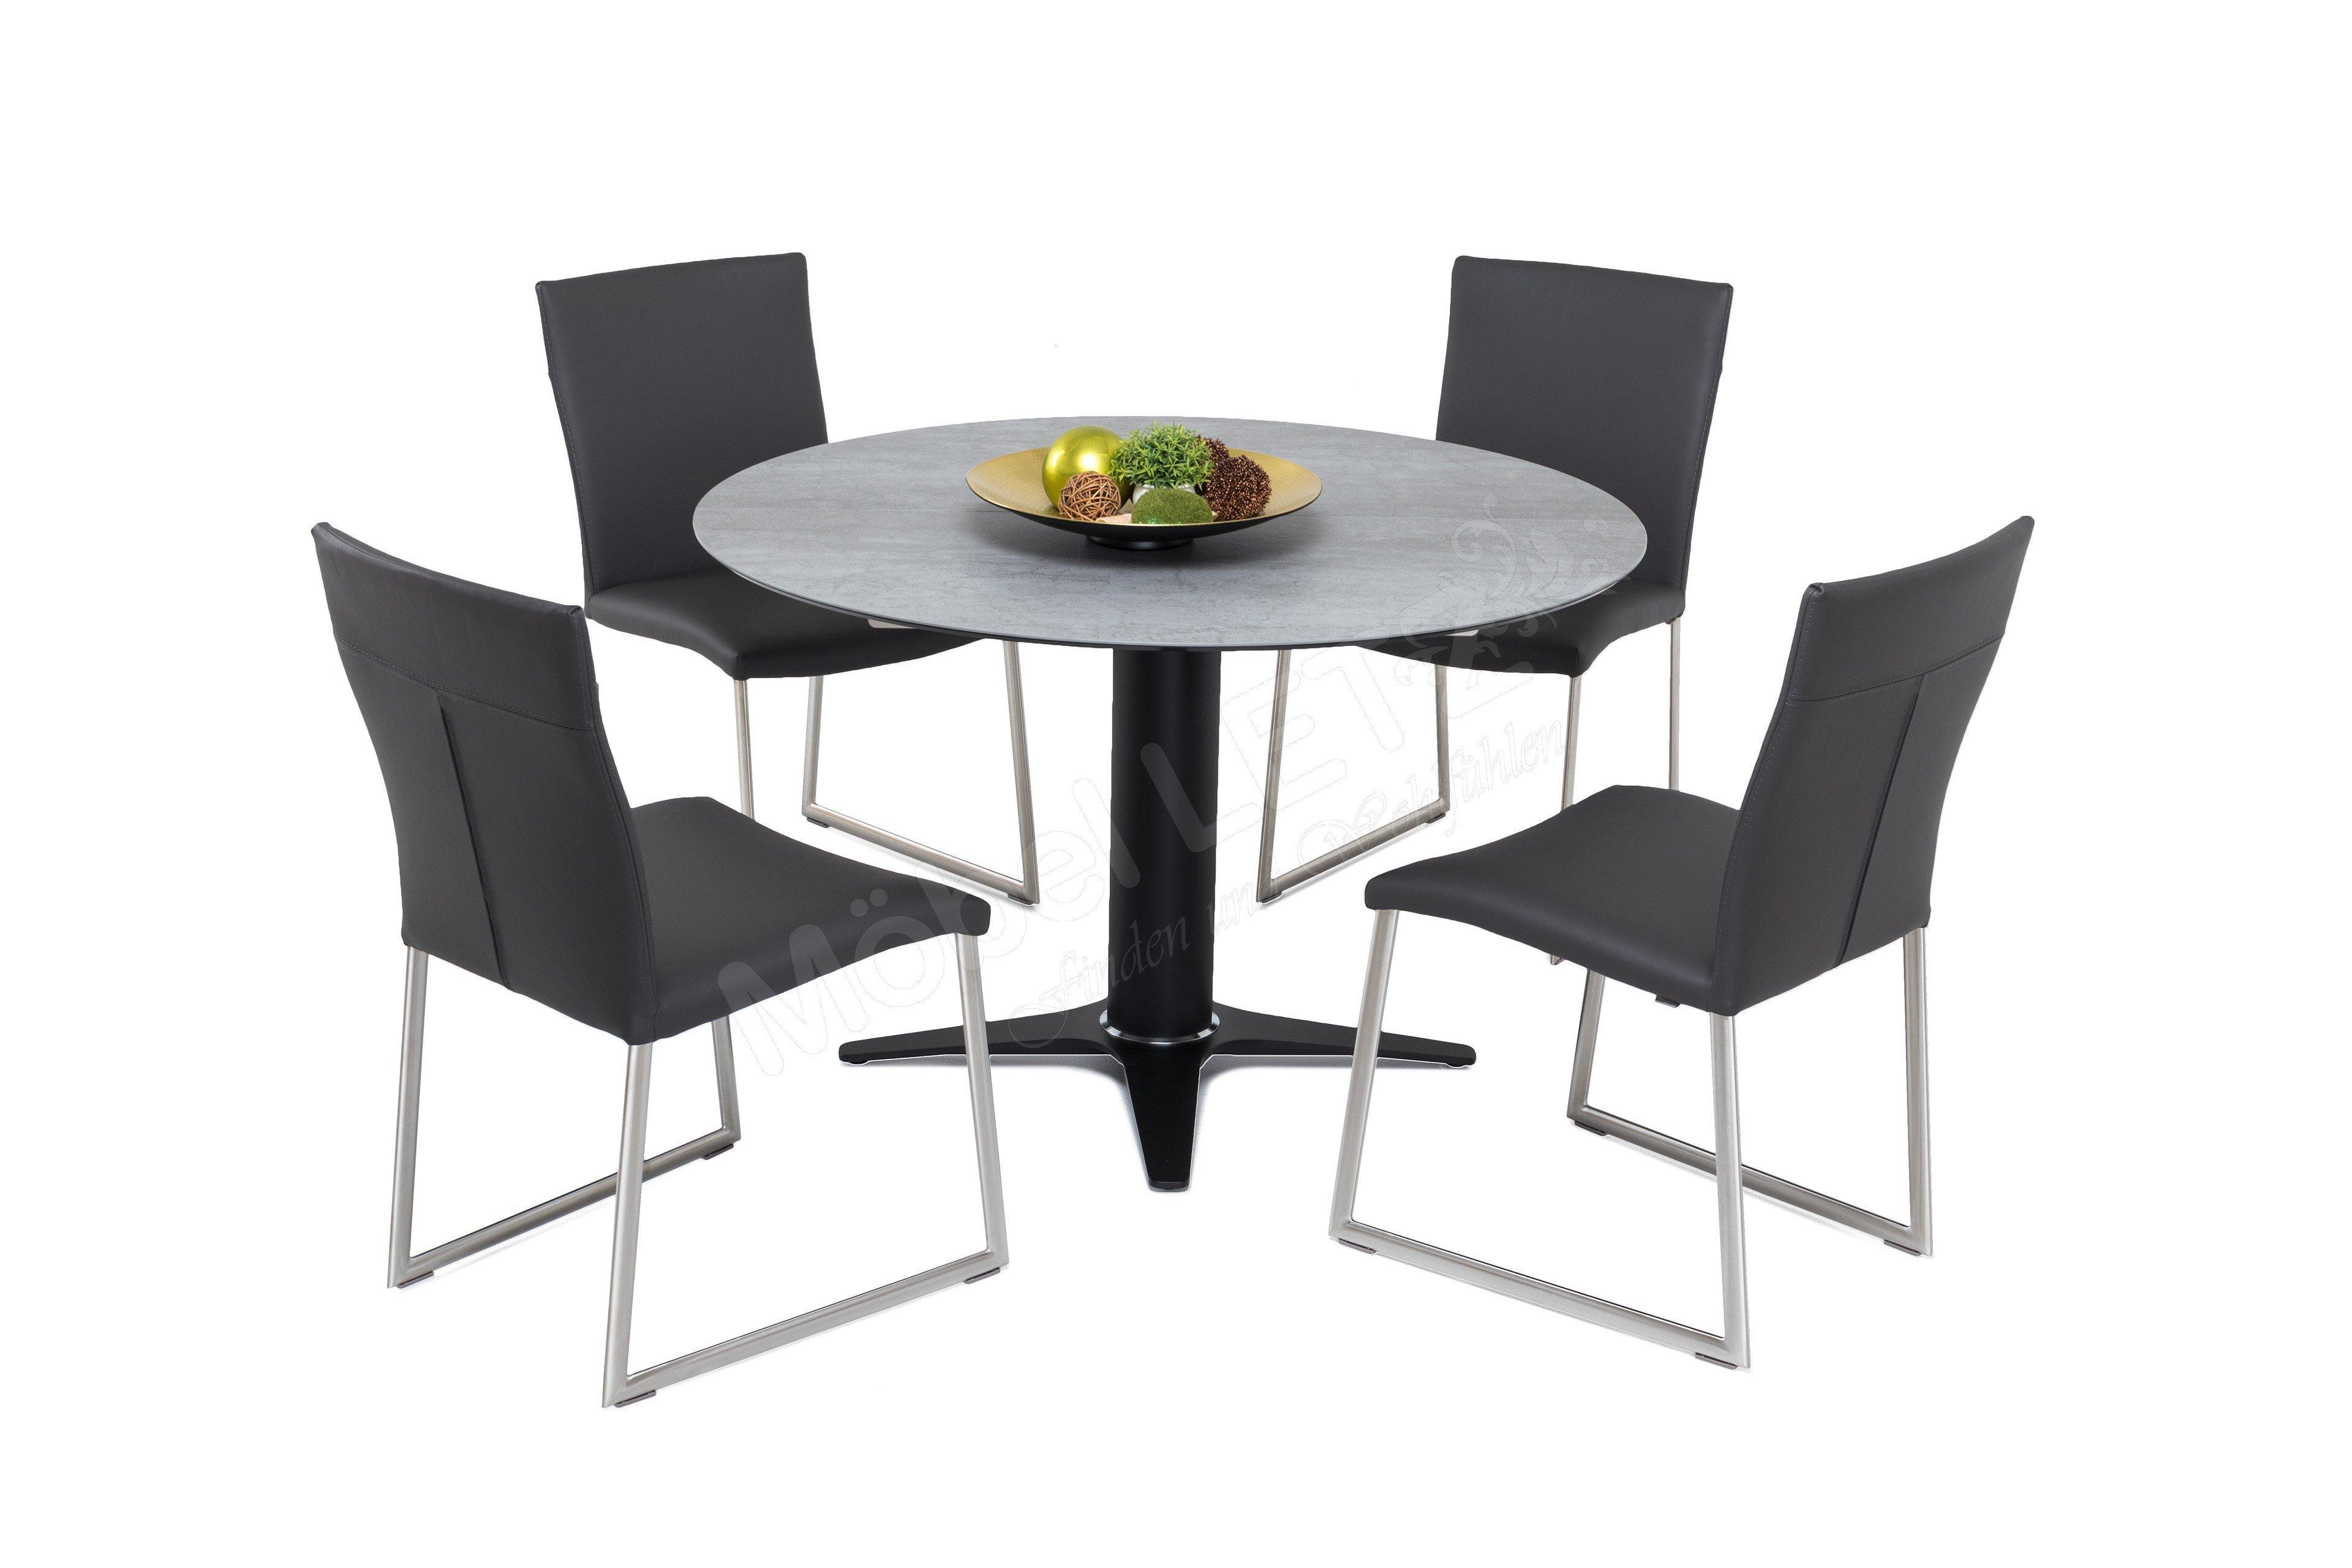 ronald schmitt esstisch p 4540 e keramik zementgrau. Black Bedroom Furniture Sets. Home Design Ideas